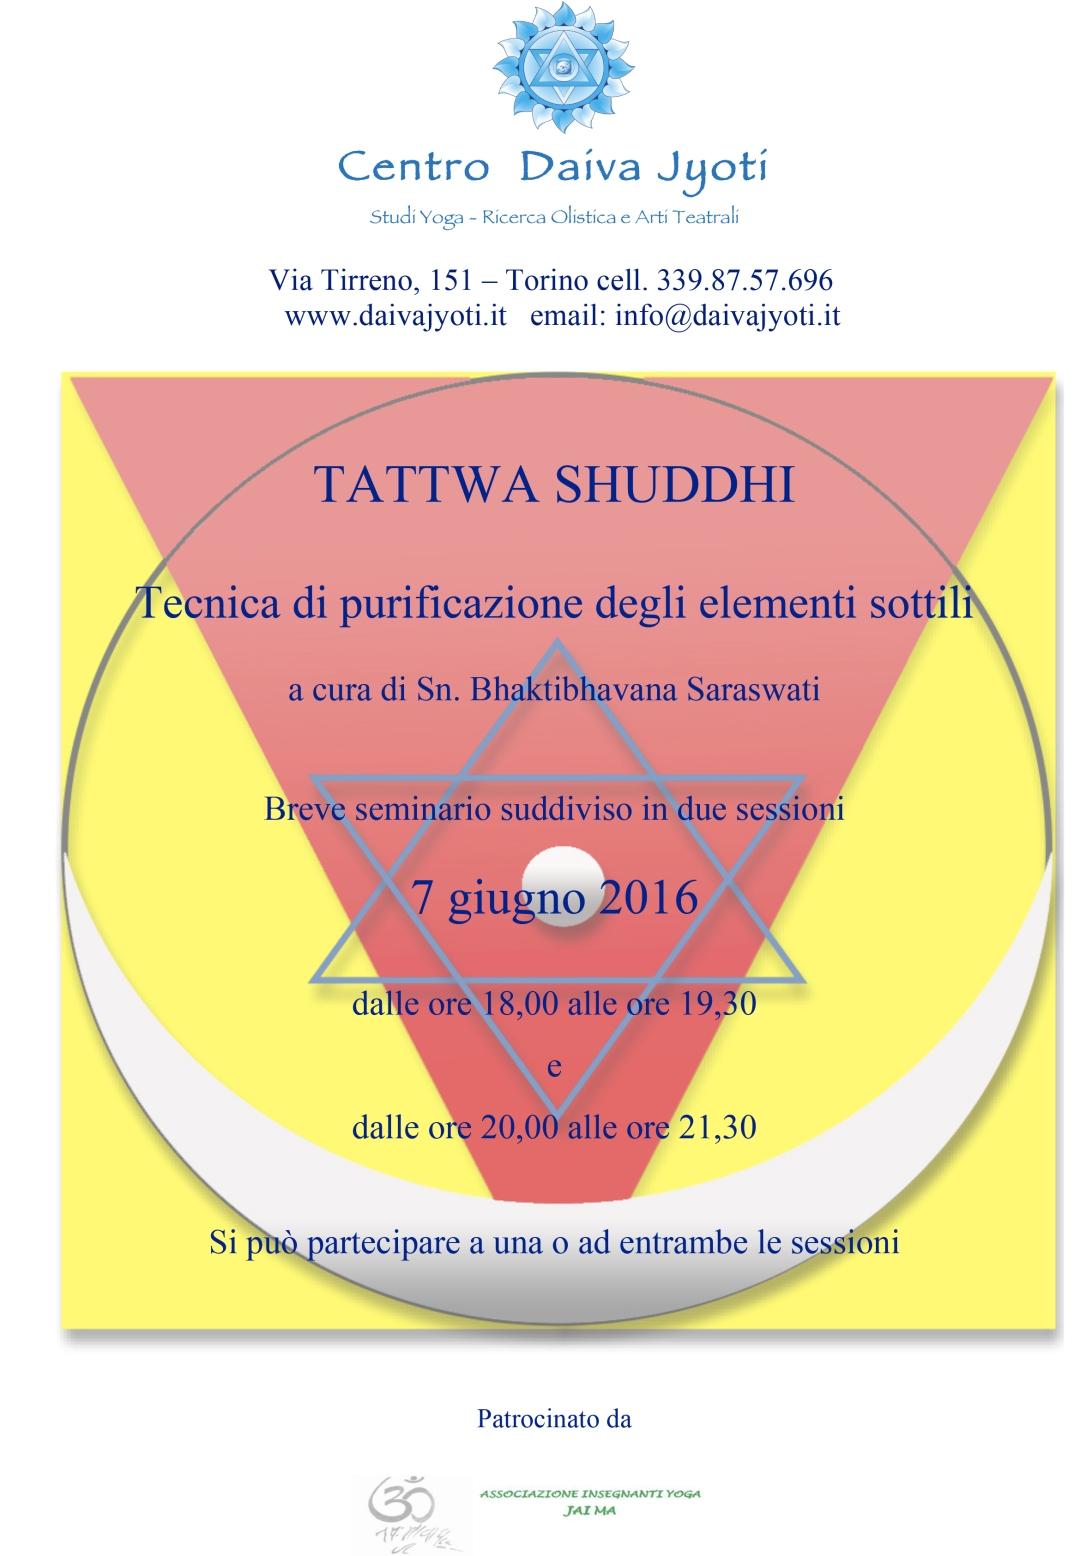 Microsoft Word - NEW TATTWA SHUDDHI 7 GIUGNO 2016.docx